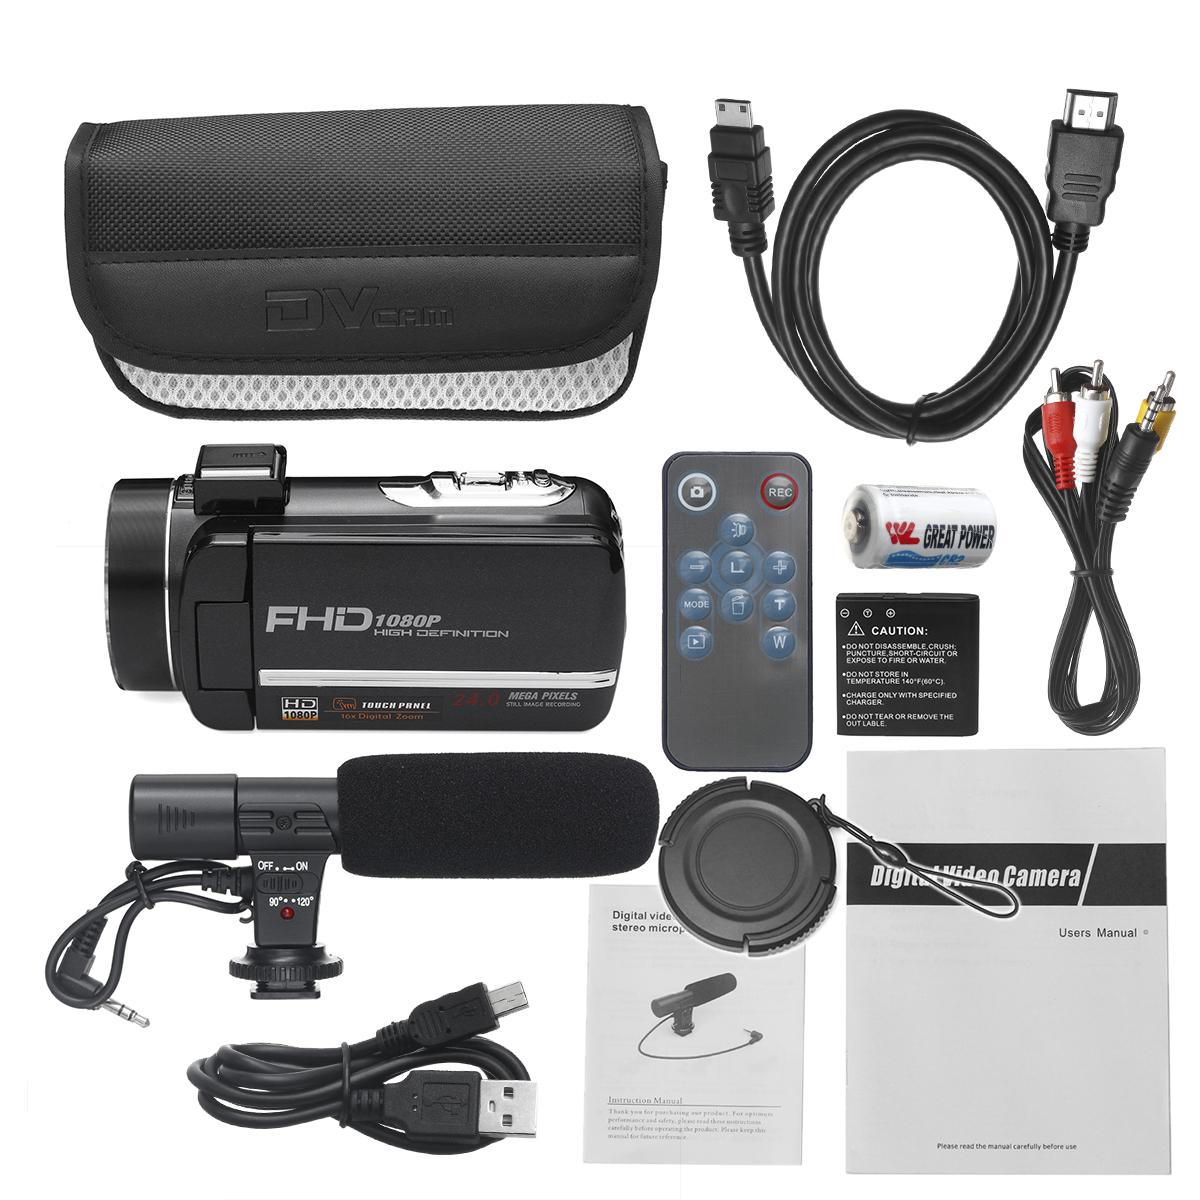 FHD 1080P 24MP 3 Inch LCD 16X ZOOM Night Vision Digital Video DV Camera Car DVR